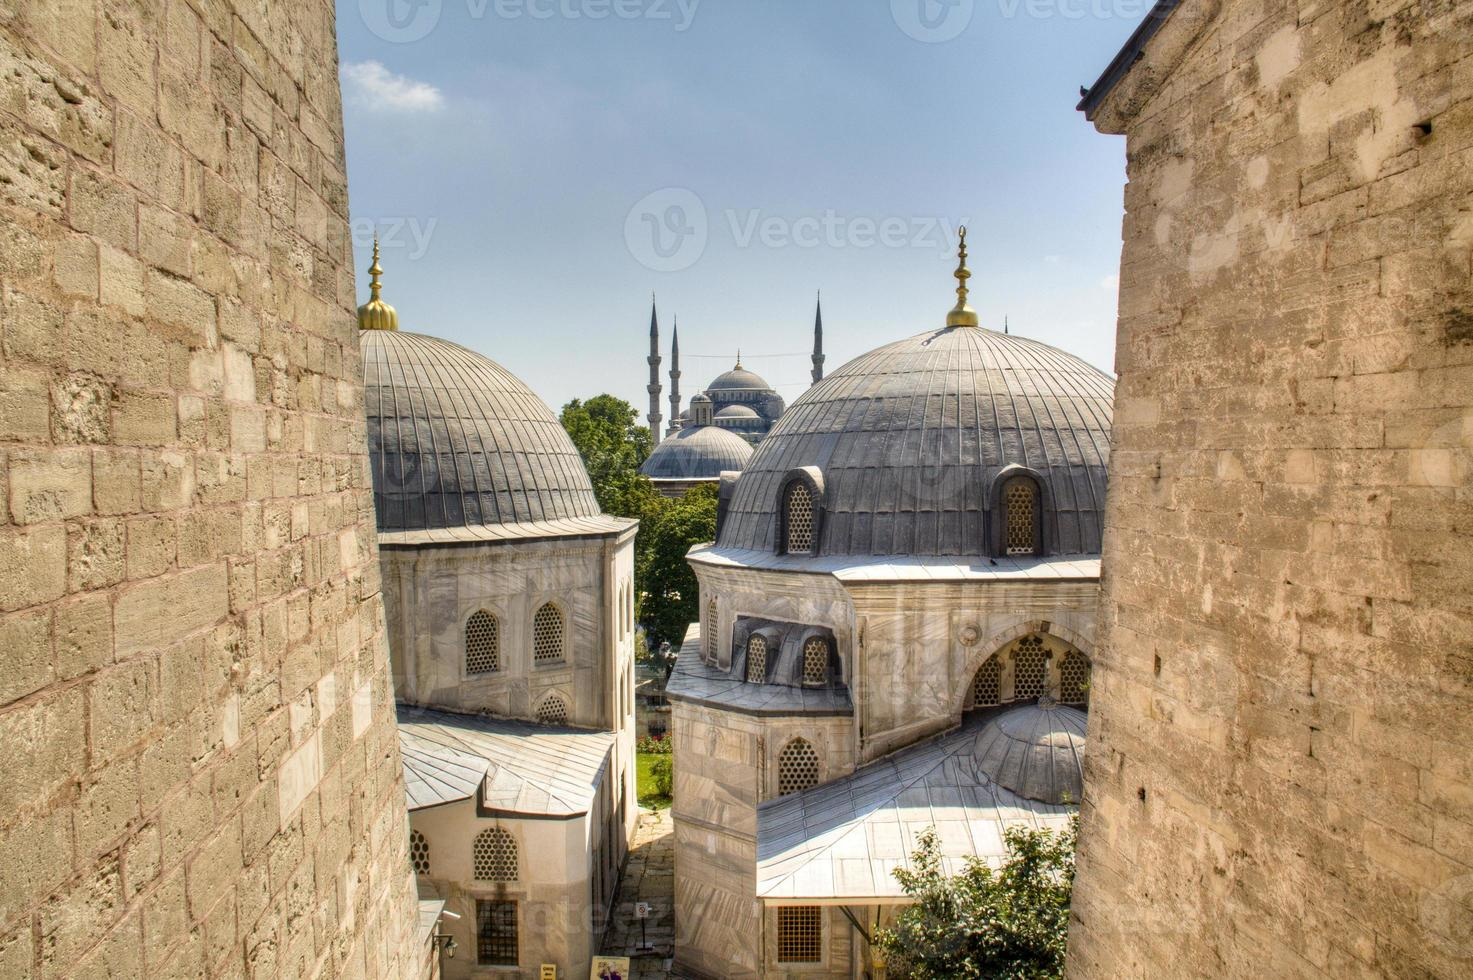 mosquée bleue vue de la hagia sophia photo